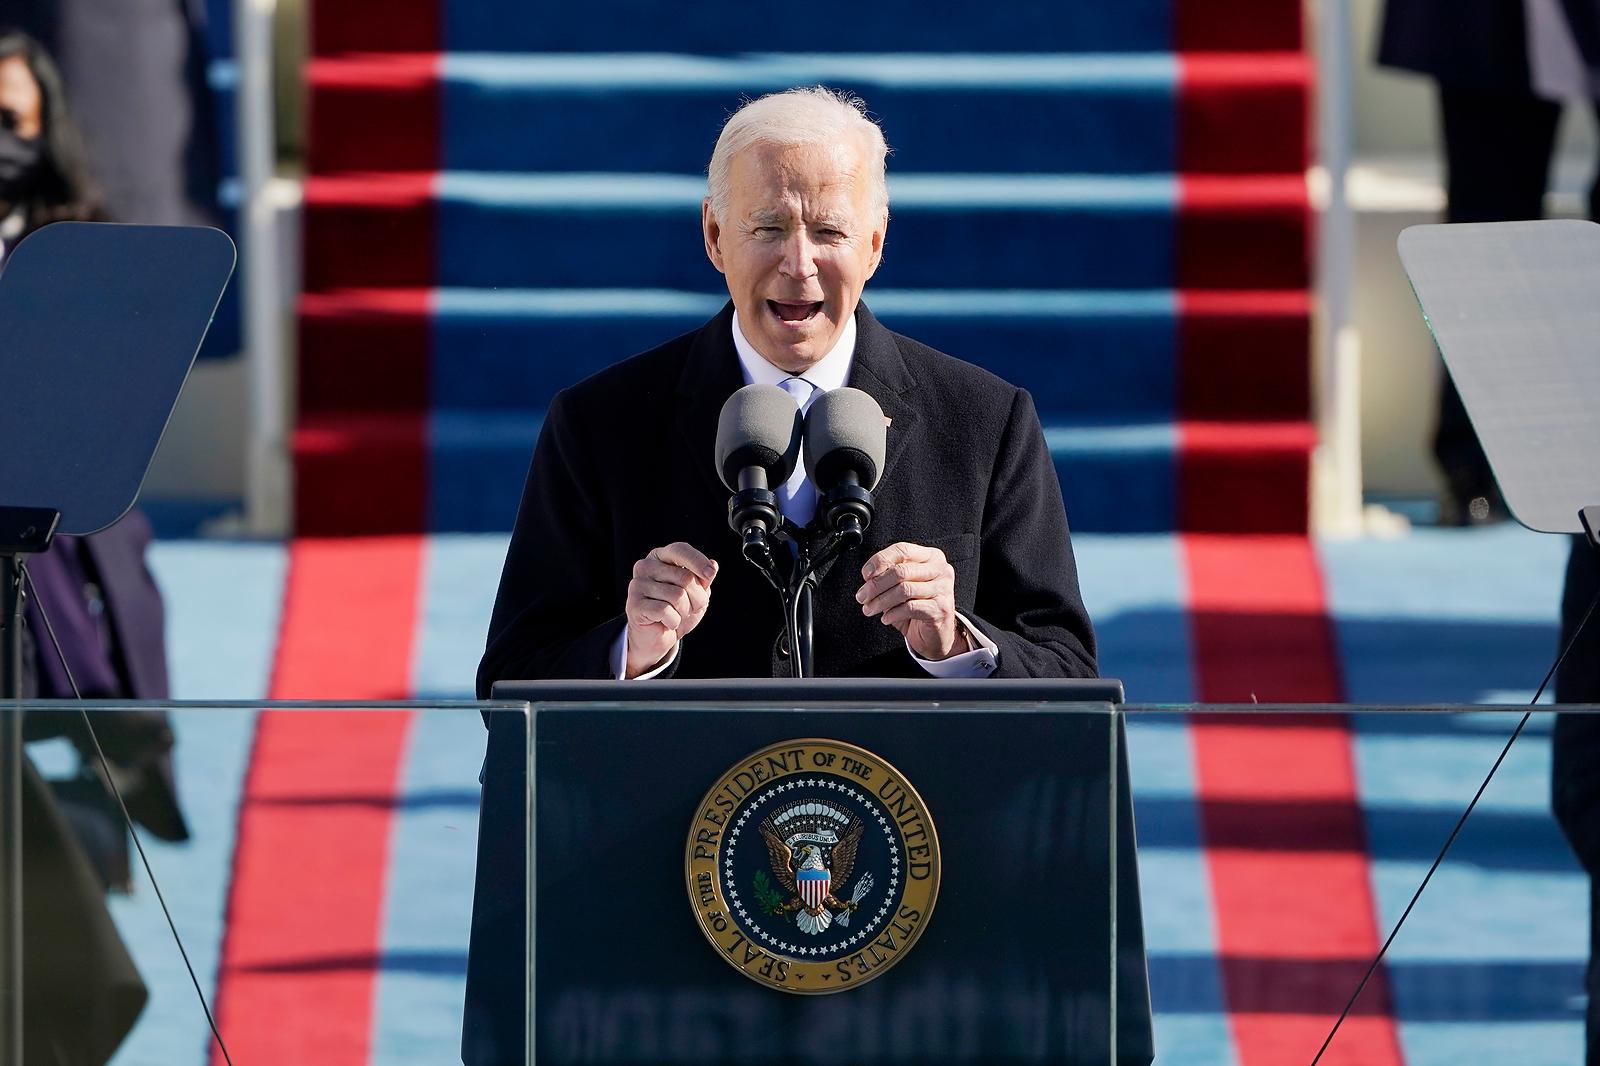 President Joe Biden speaks during the 59th Presidential Inauguration at the U.S. Capitol in Washington, Wednesday, Jan. 20, 2021. AP